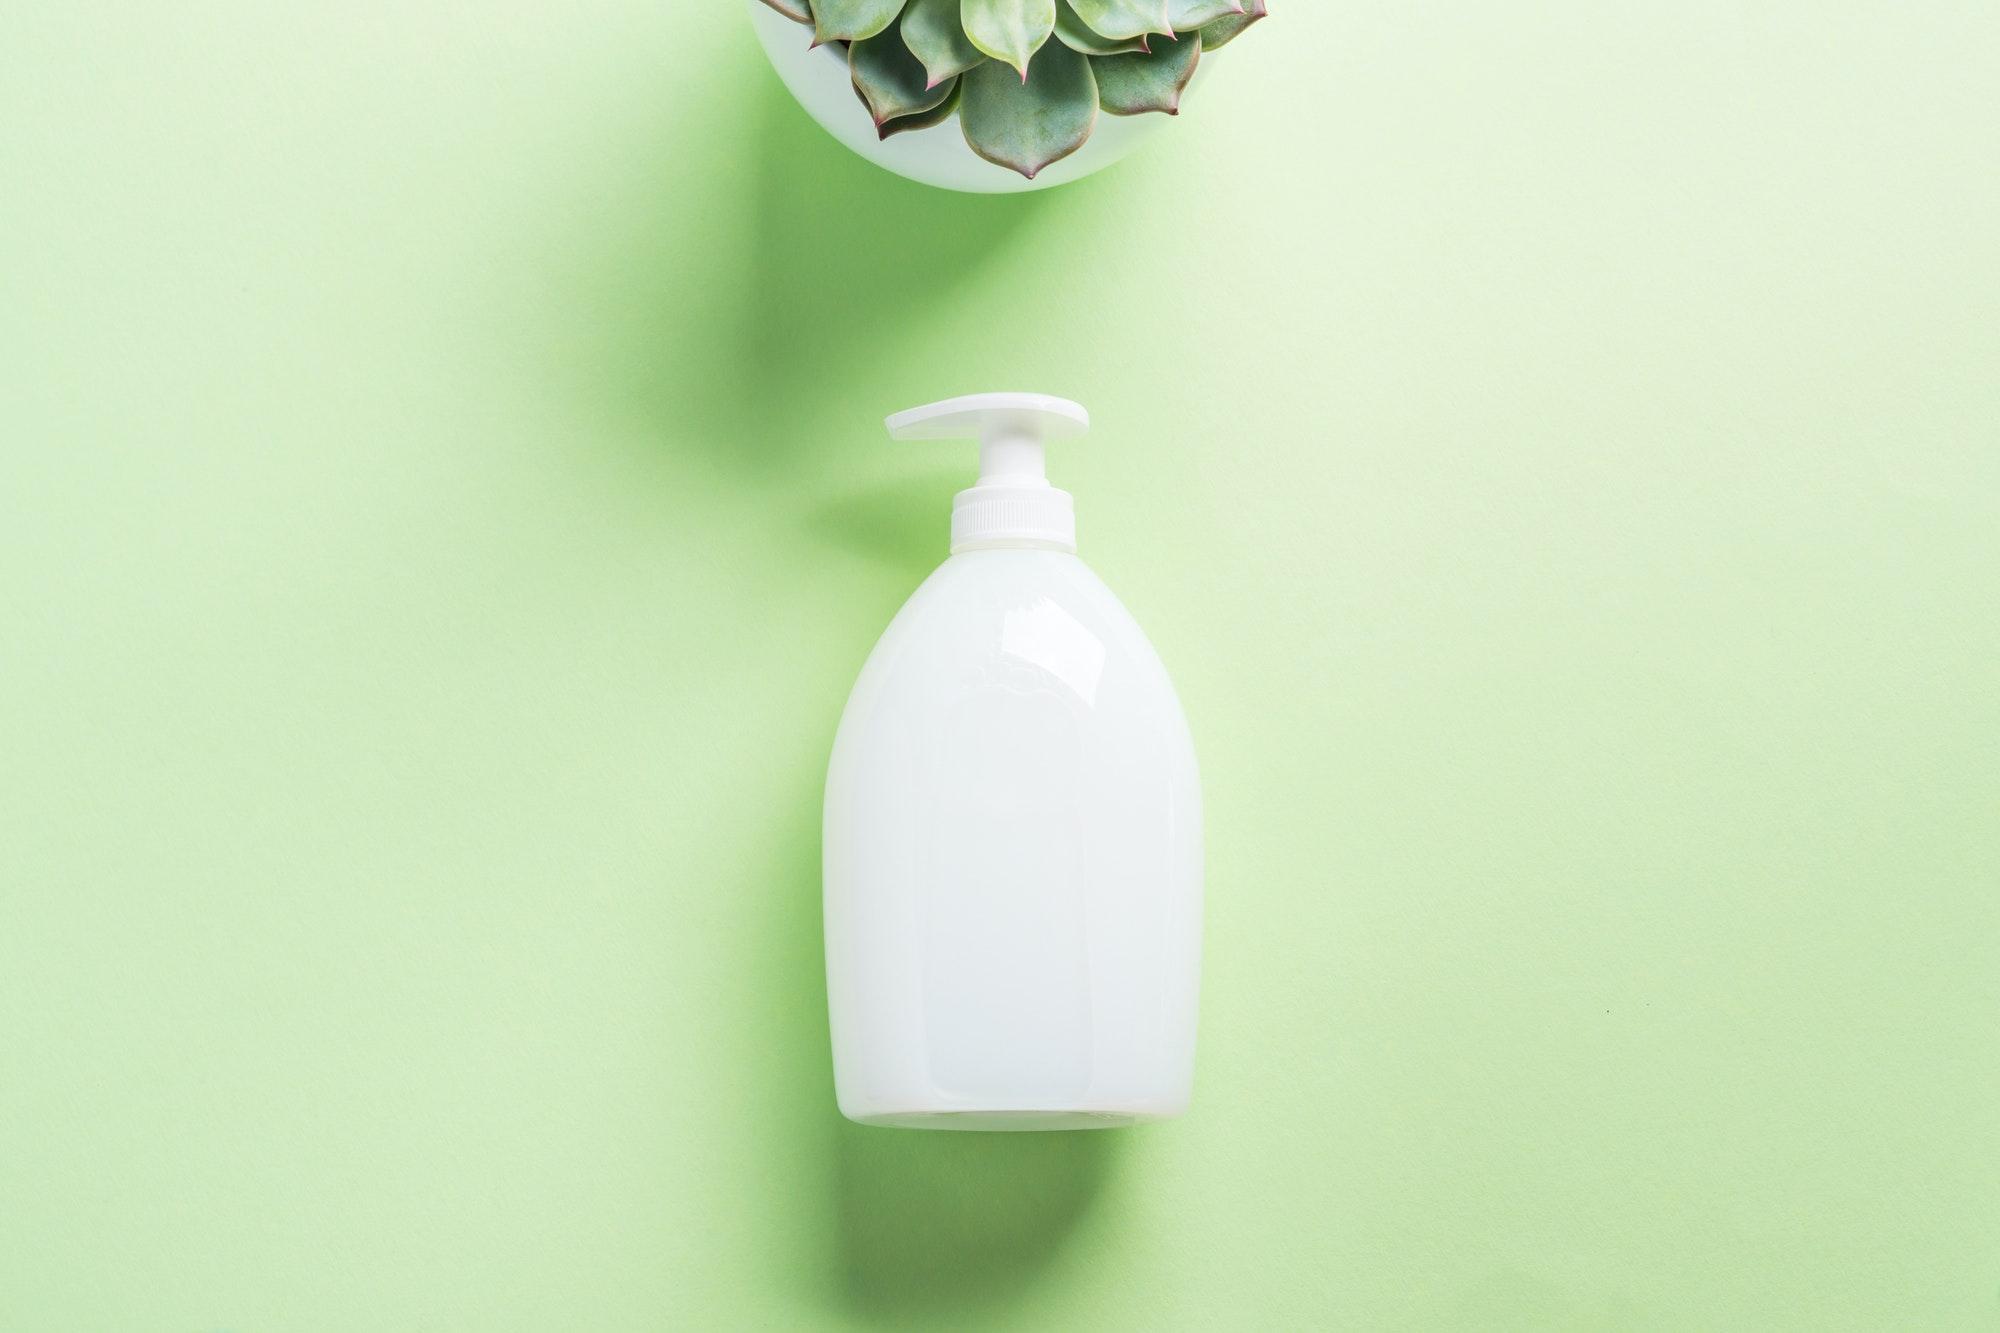 White natural soap bottle on pastel green